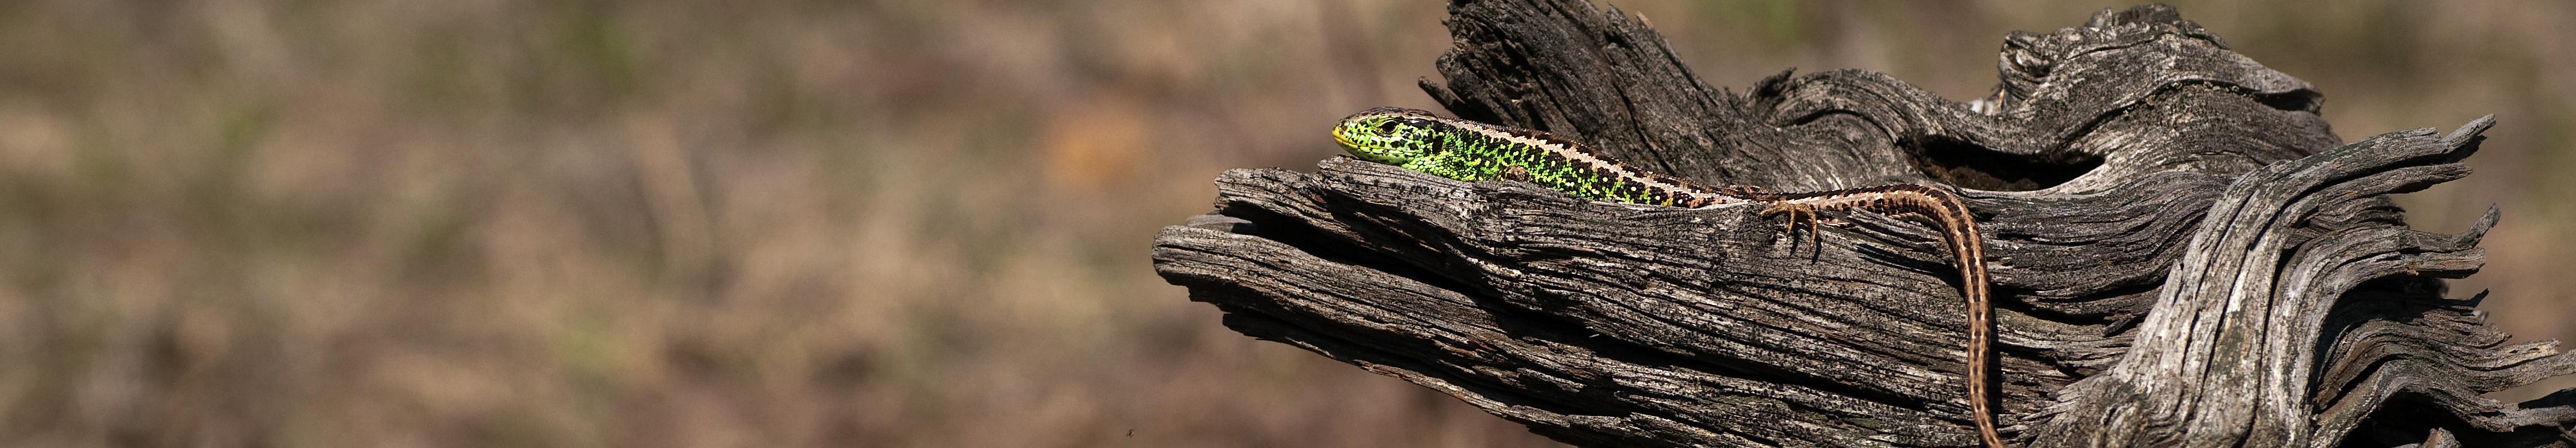 Zauneidechse (Lacerta agilis) © Frank Leo/fokus-natur.de